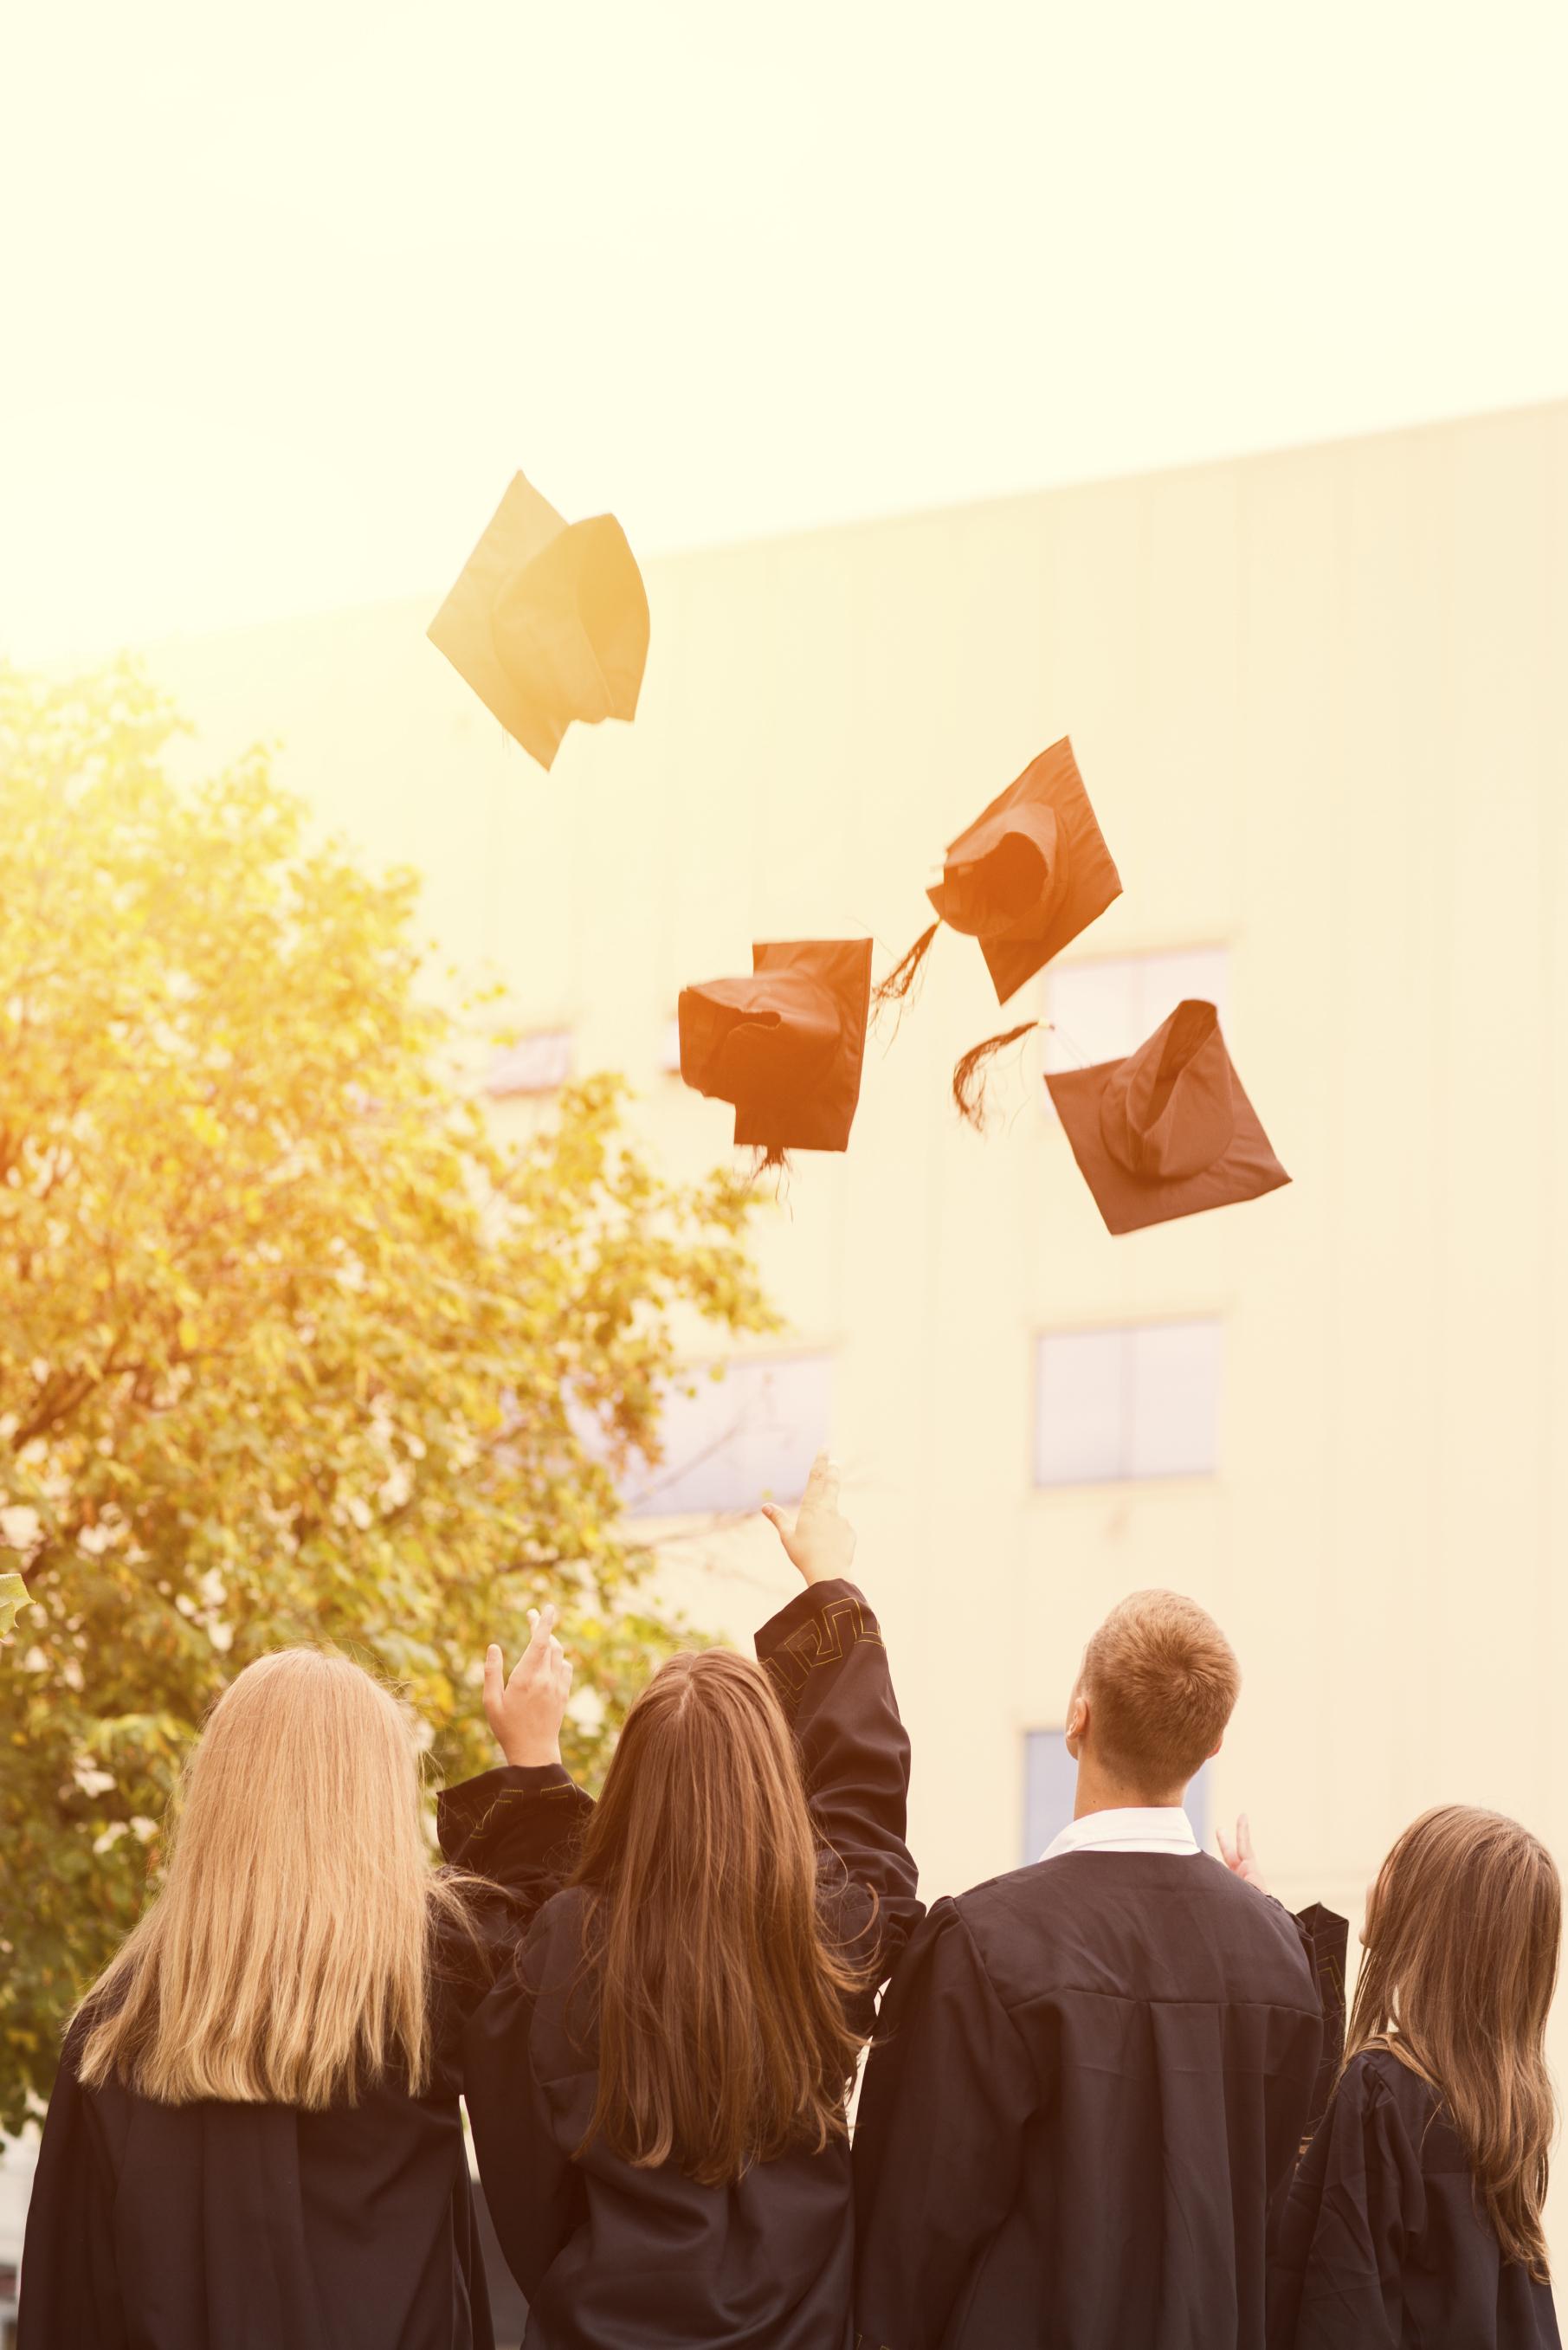 Graduation_iStock_000074561141_Large.jpg